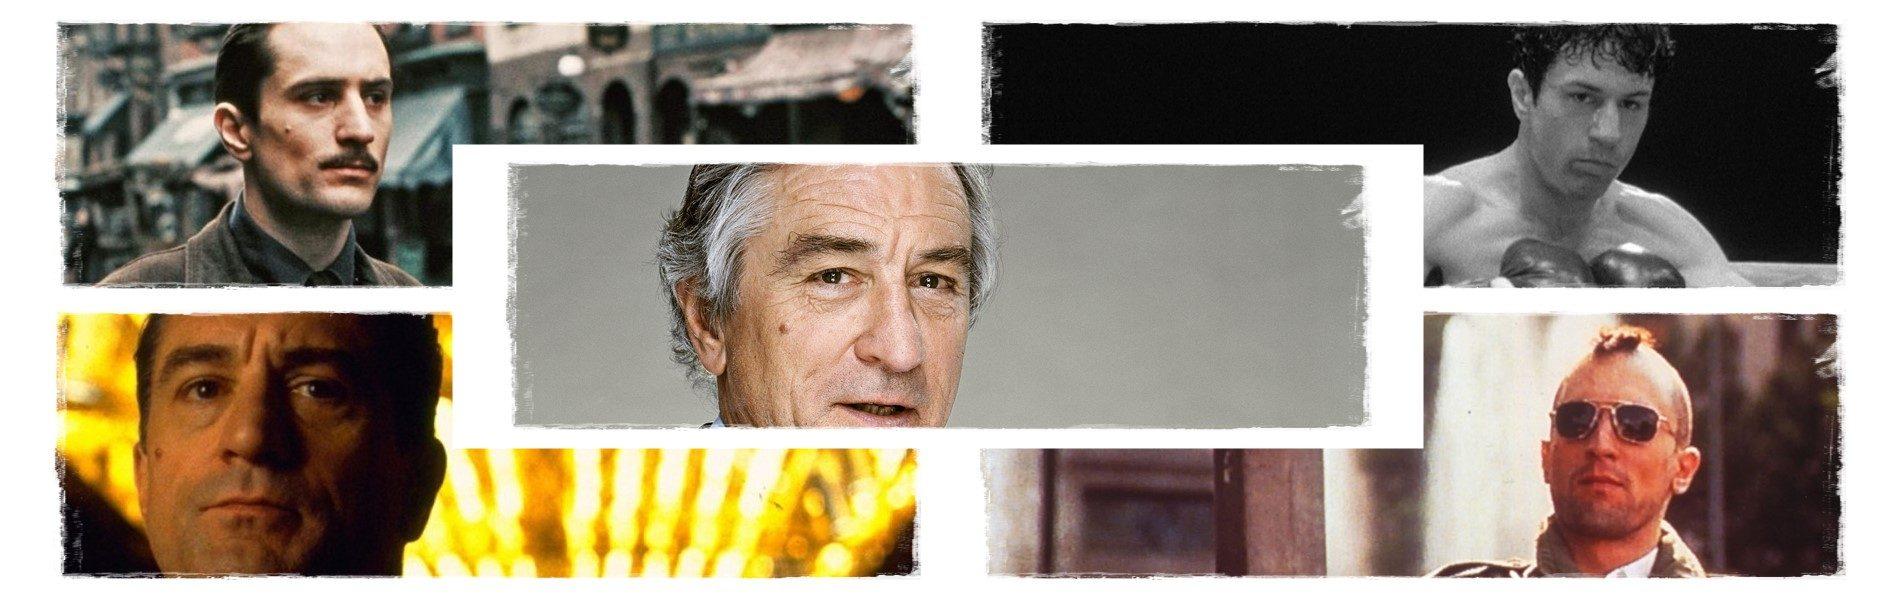 Robert De Niro legjobb filmjei